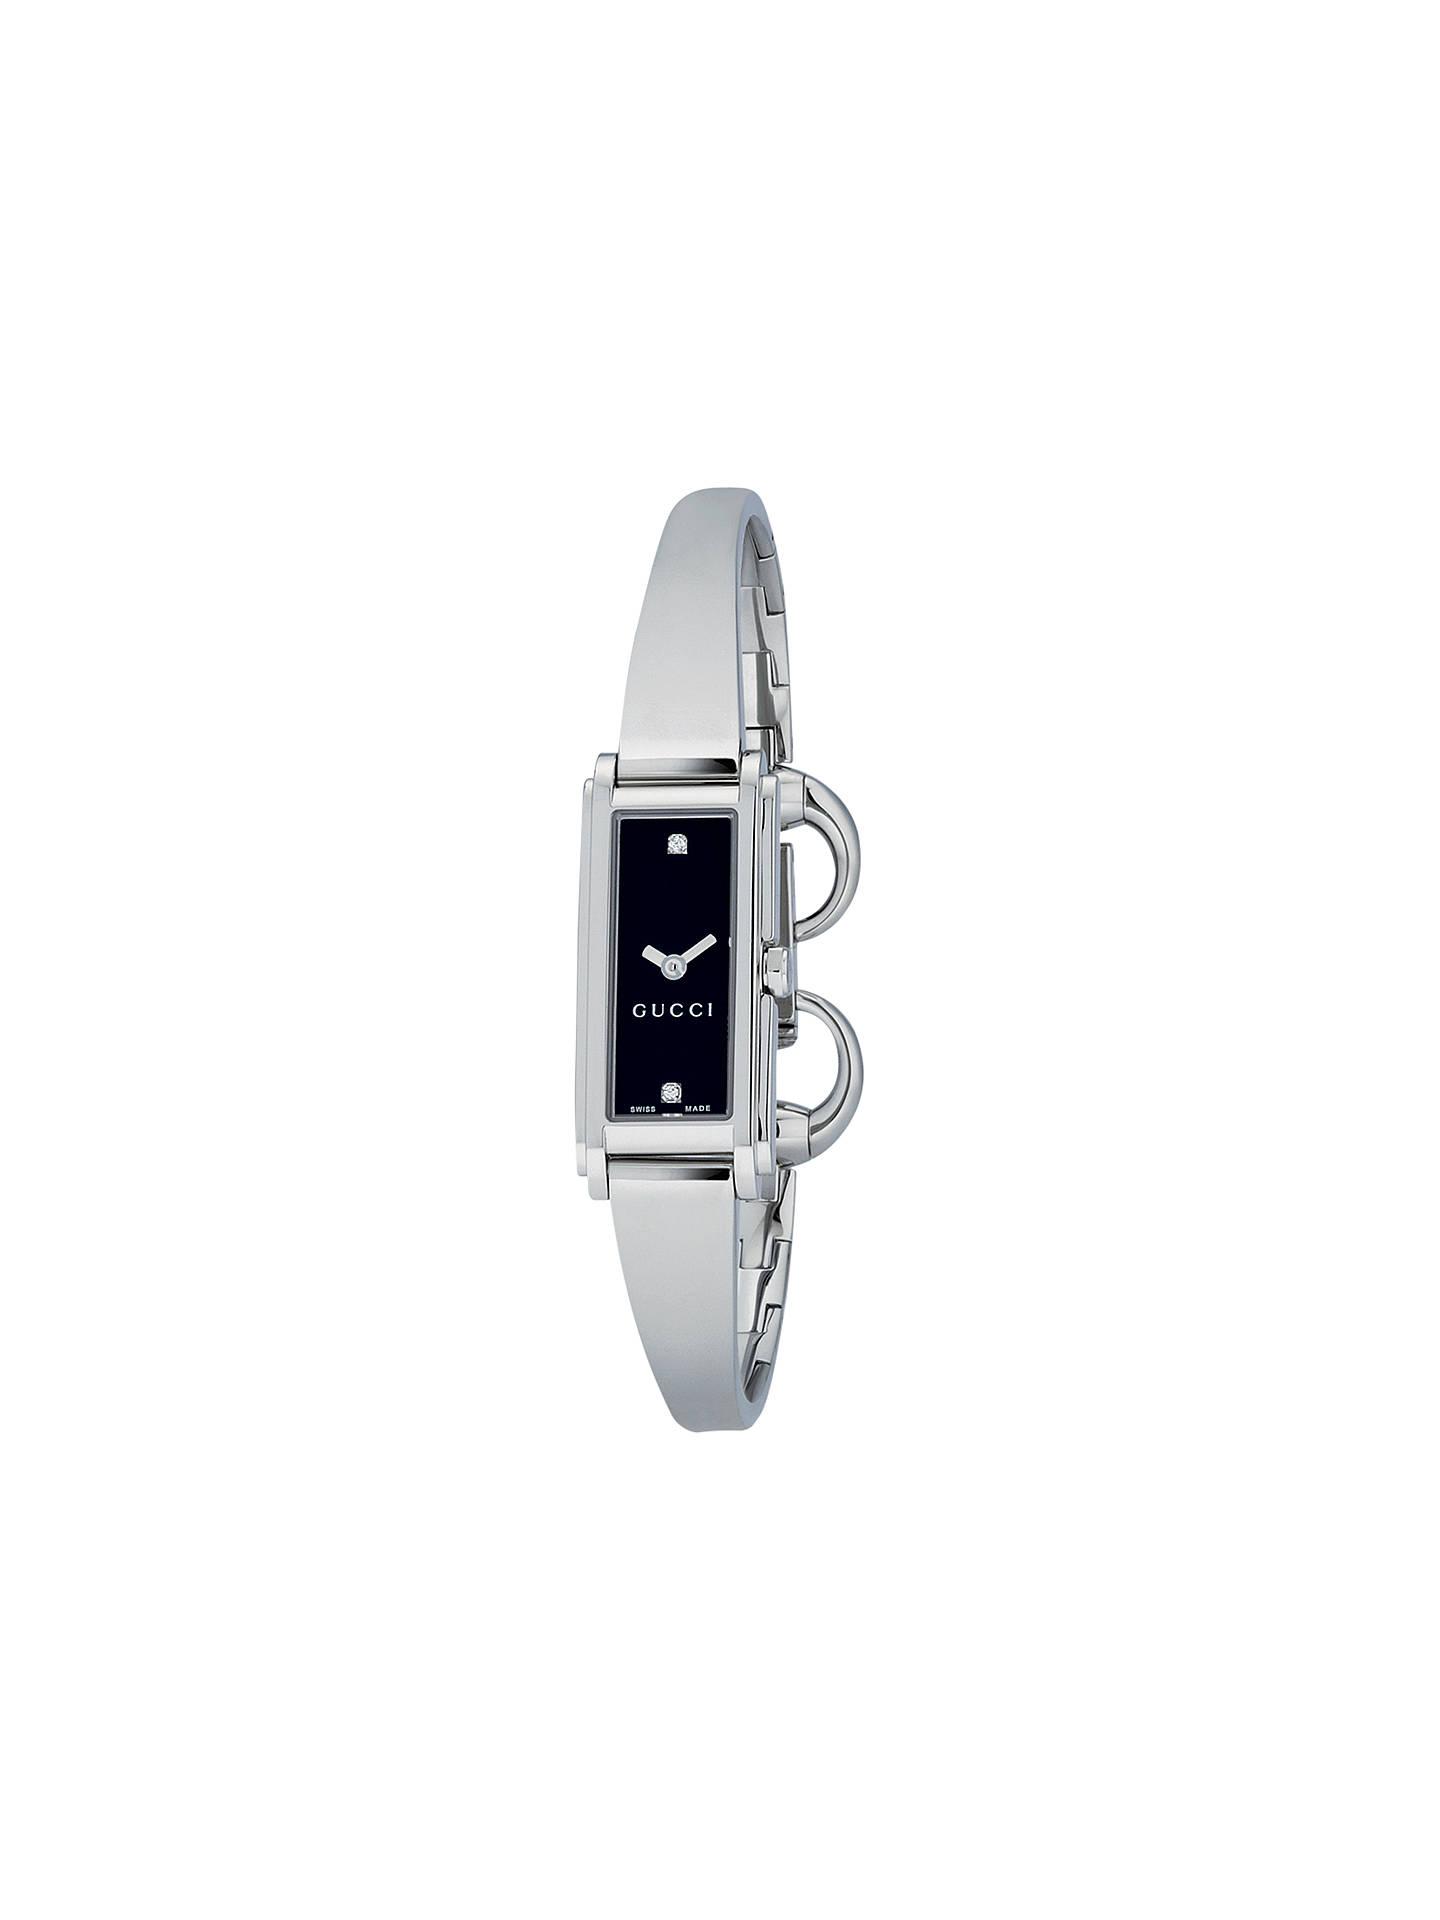 9f7cb5ad5ed Buy Gucci YA109518 Women s G-Line Oblong Diamond Stainless Steel Bangle  Strap Watch